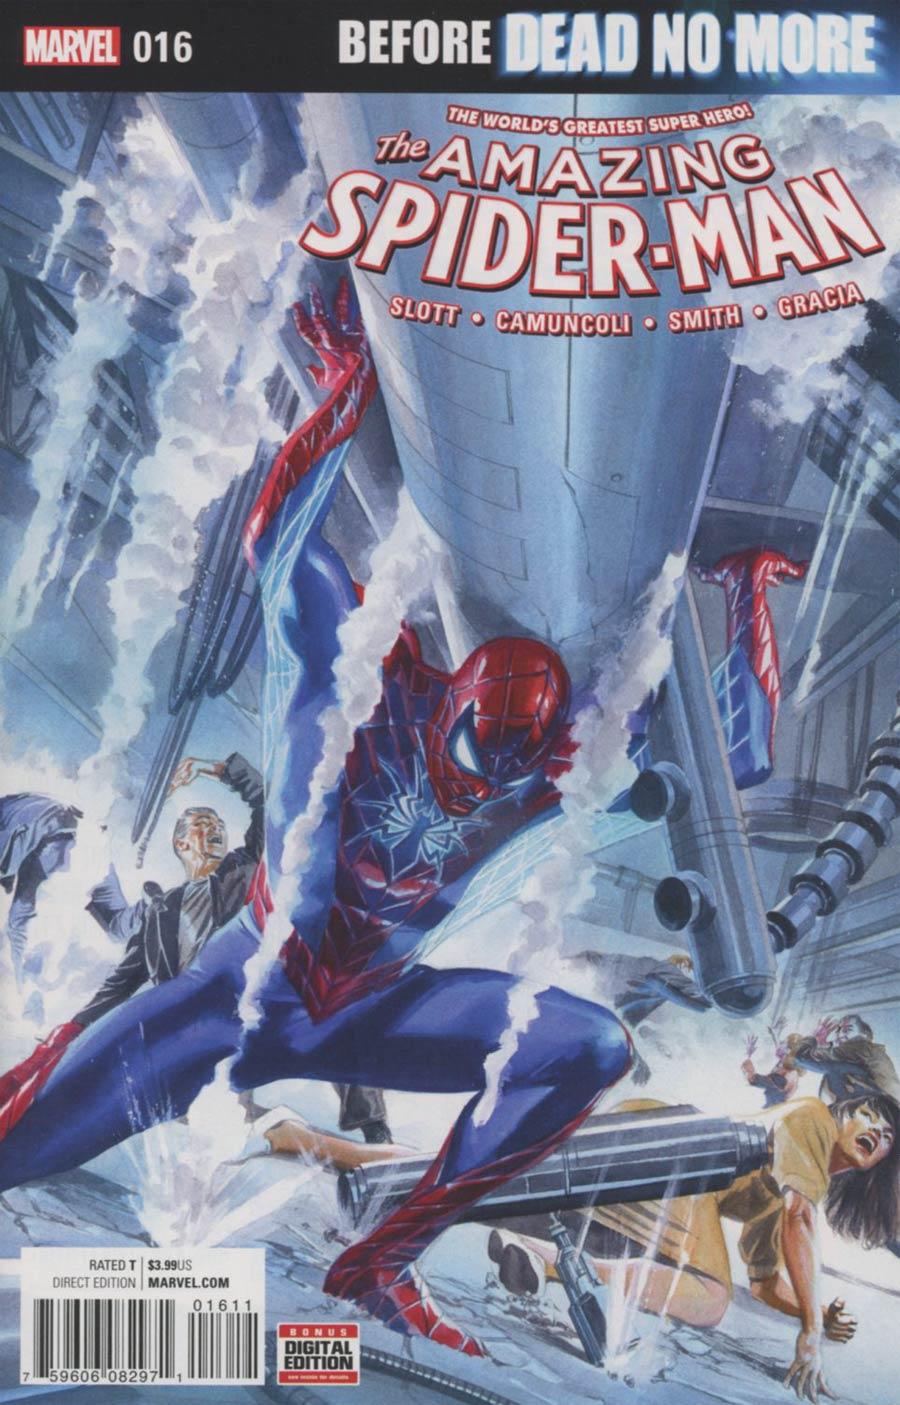 Amazing Spider-Man Vol 4 #16 Cover A Regular Alex Ross Cover (Dead No More Prelude)